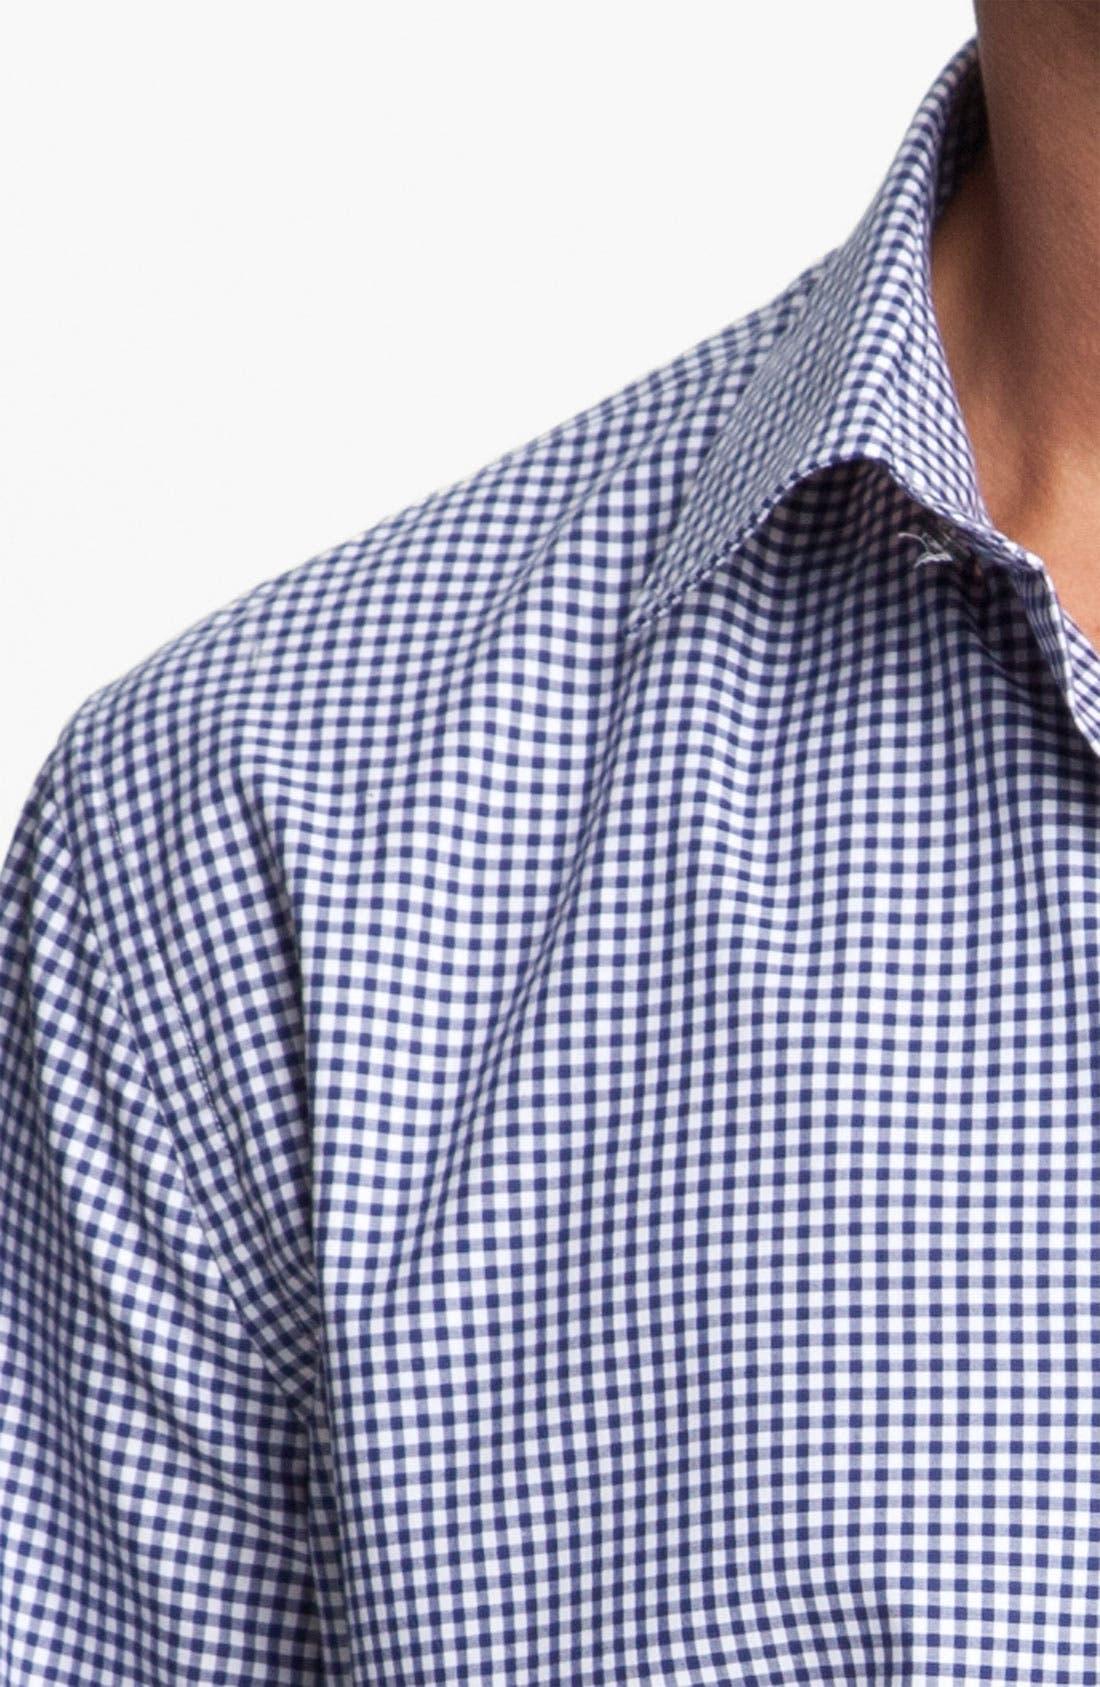 Alternate Image 3  - Paul Smith London Gingham Dress Shirt